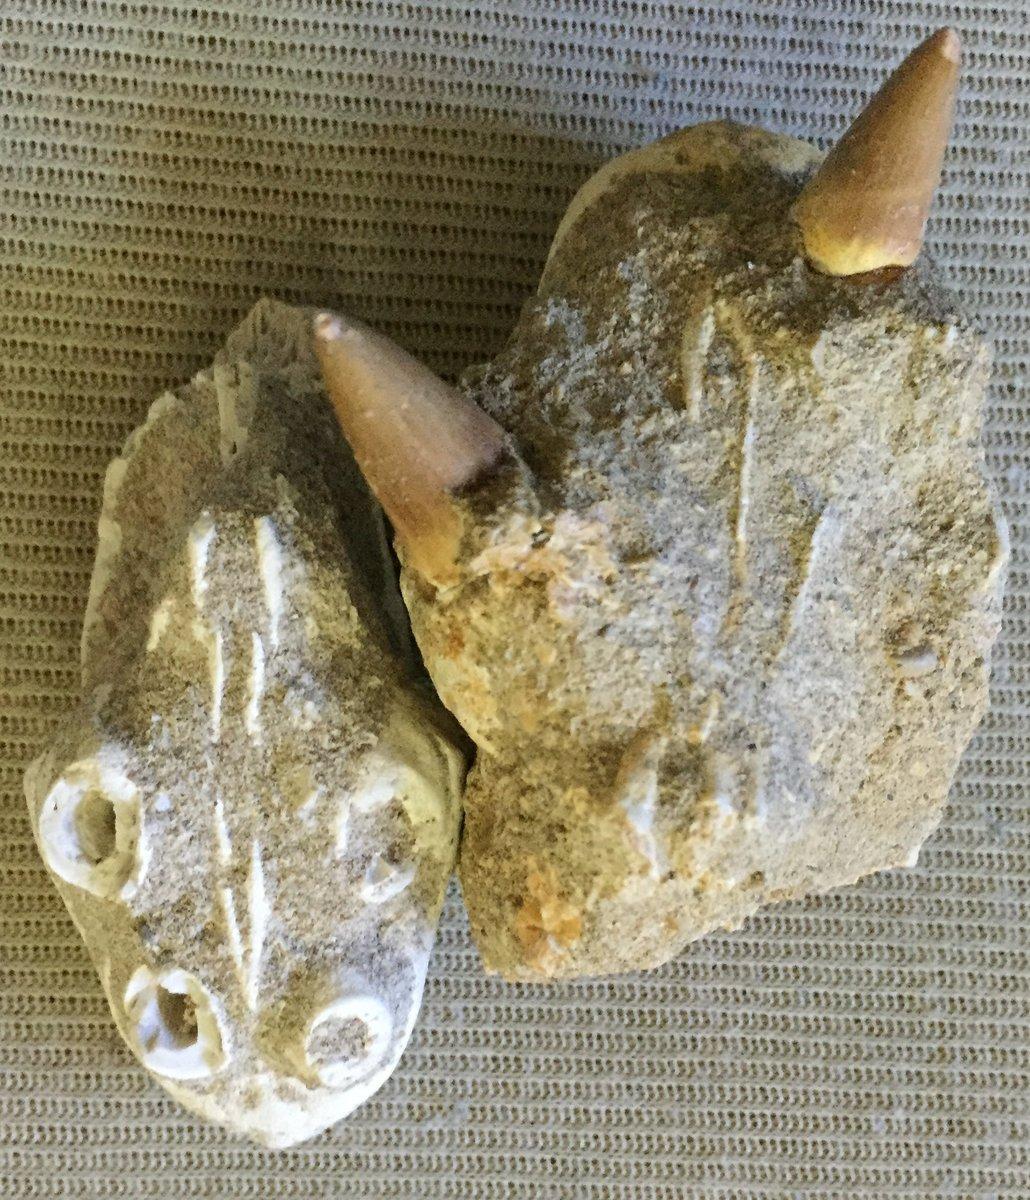 Mosasaur premaxillary underside with teeth